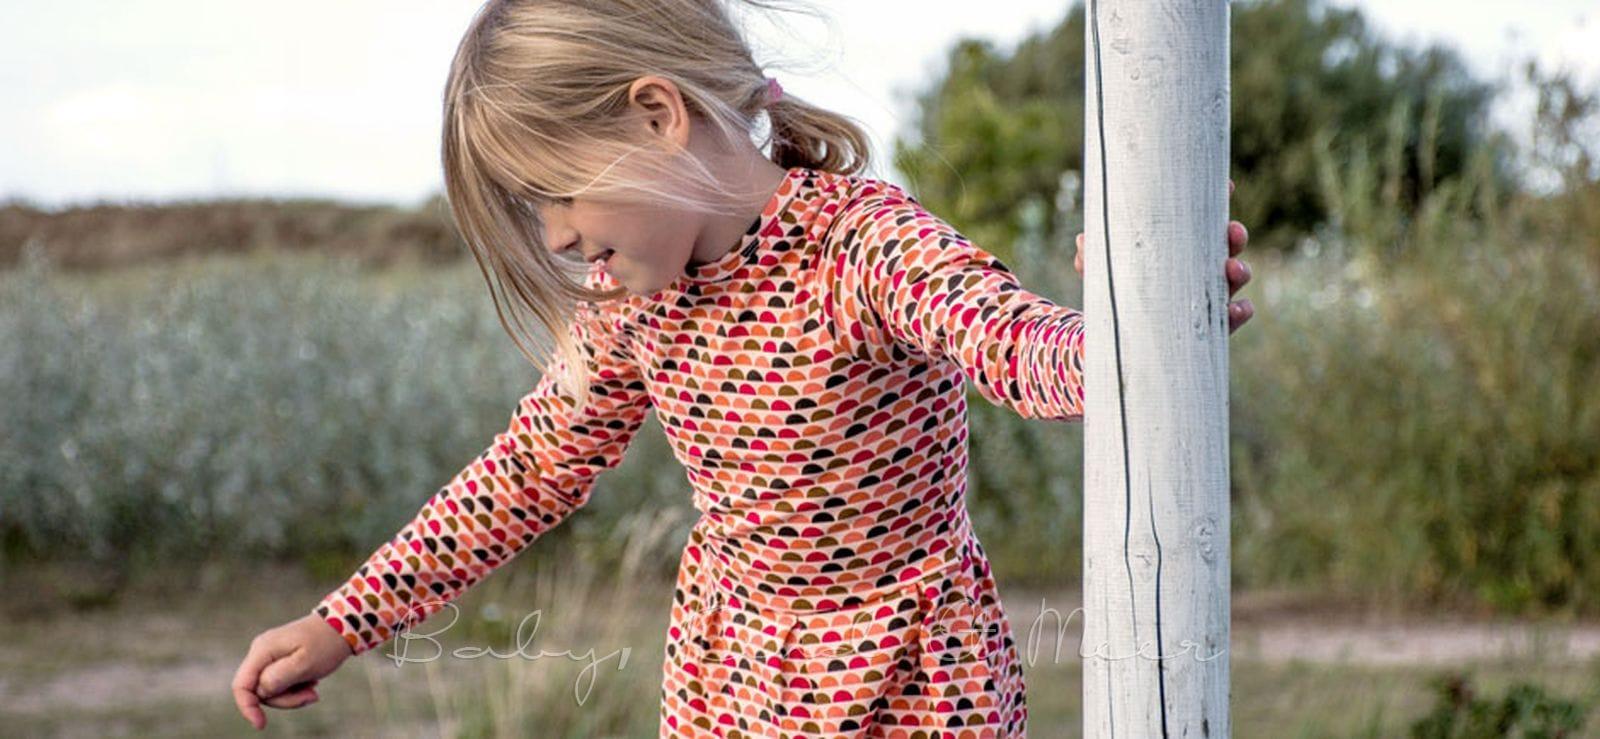 finest selection 91caa d1091 KILENDA: UNSERE ERFAHRUNGEN - Kinderkleidung - Baby, Kind ...